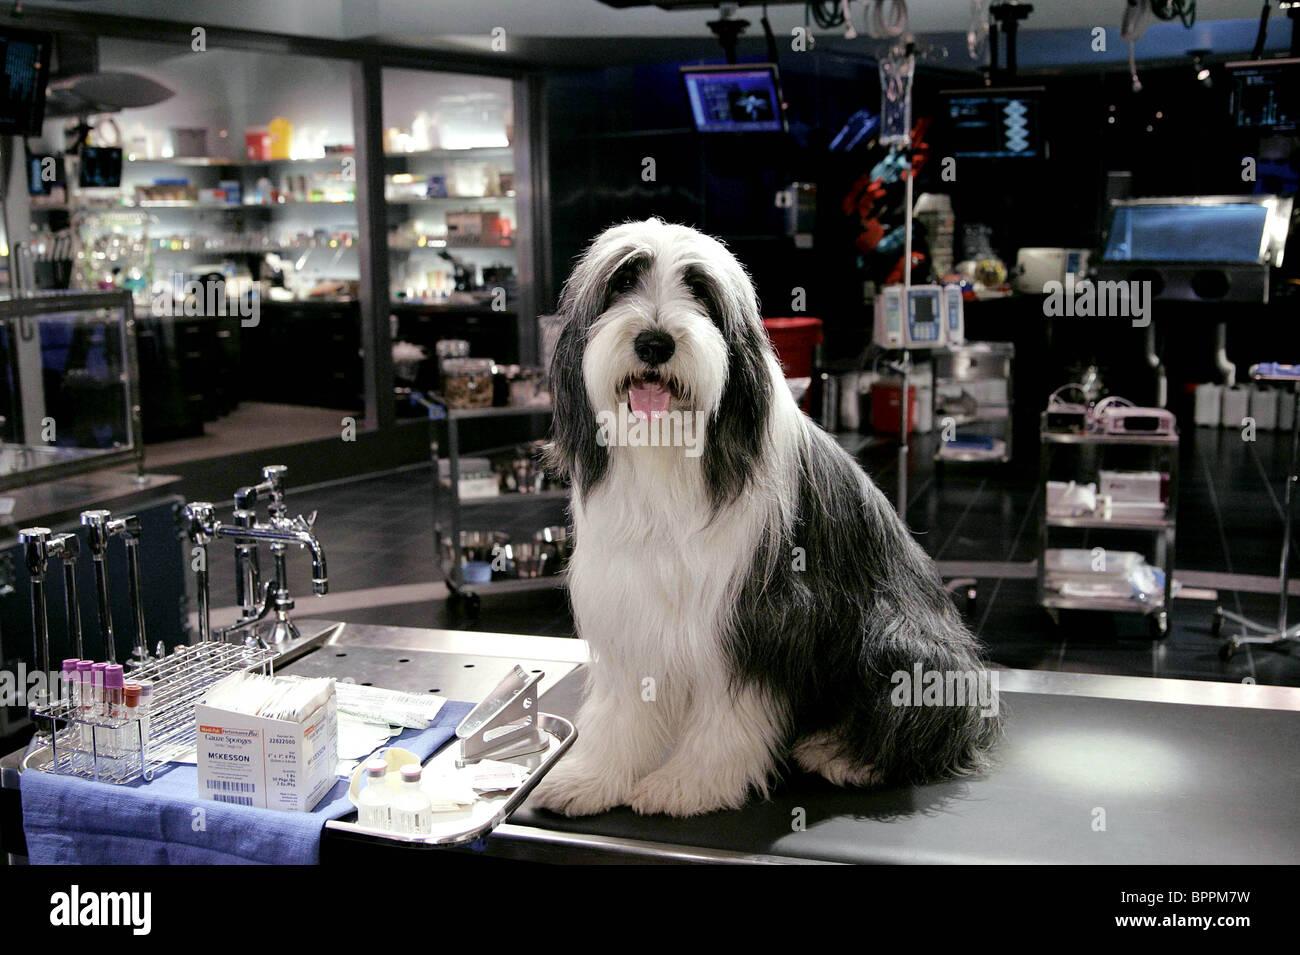 the shaggy dog (2006 film)